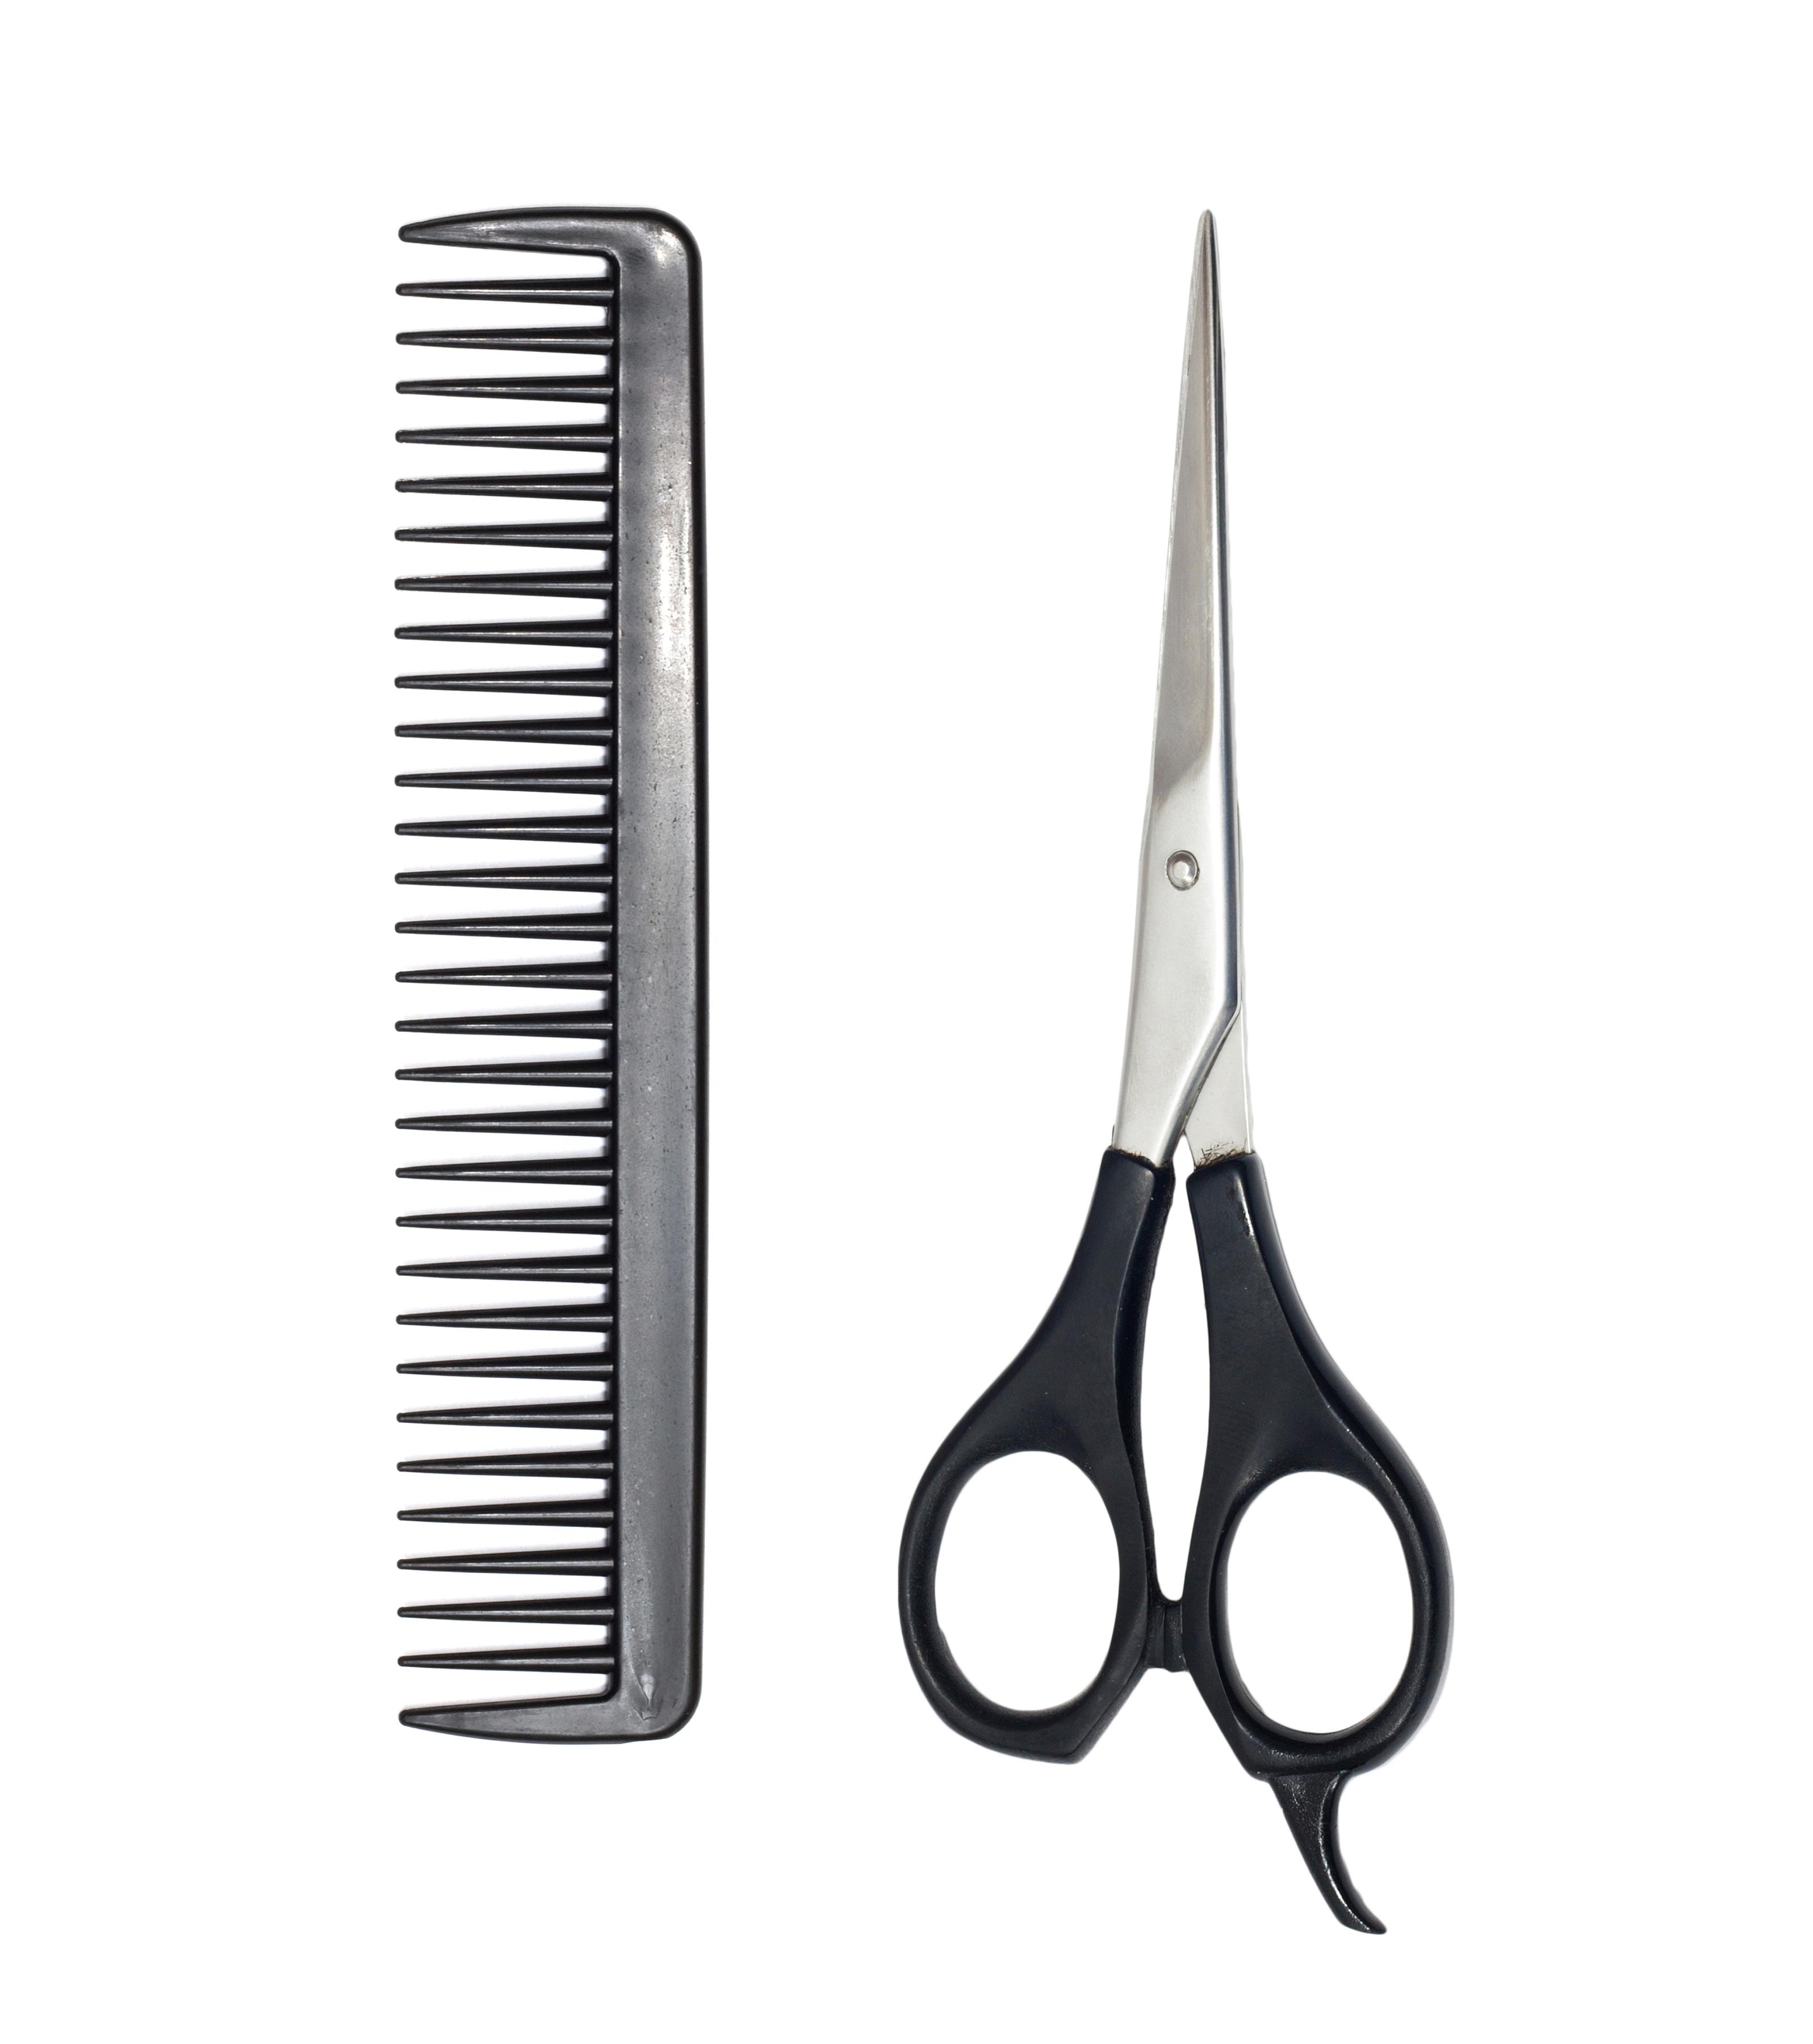 Comb And Scissors Clipart image.